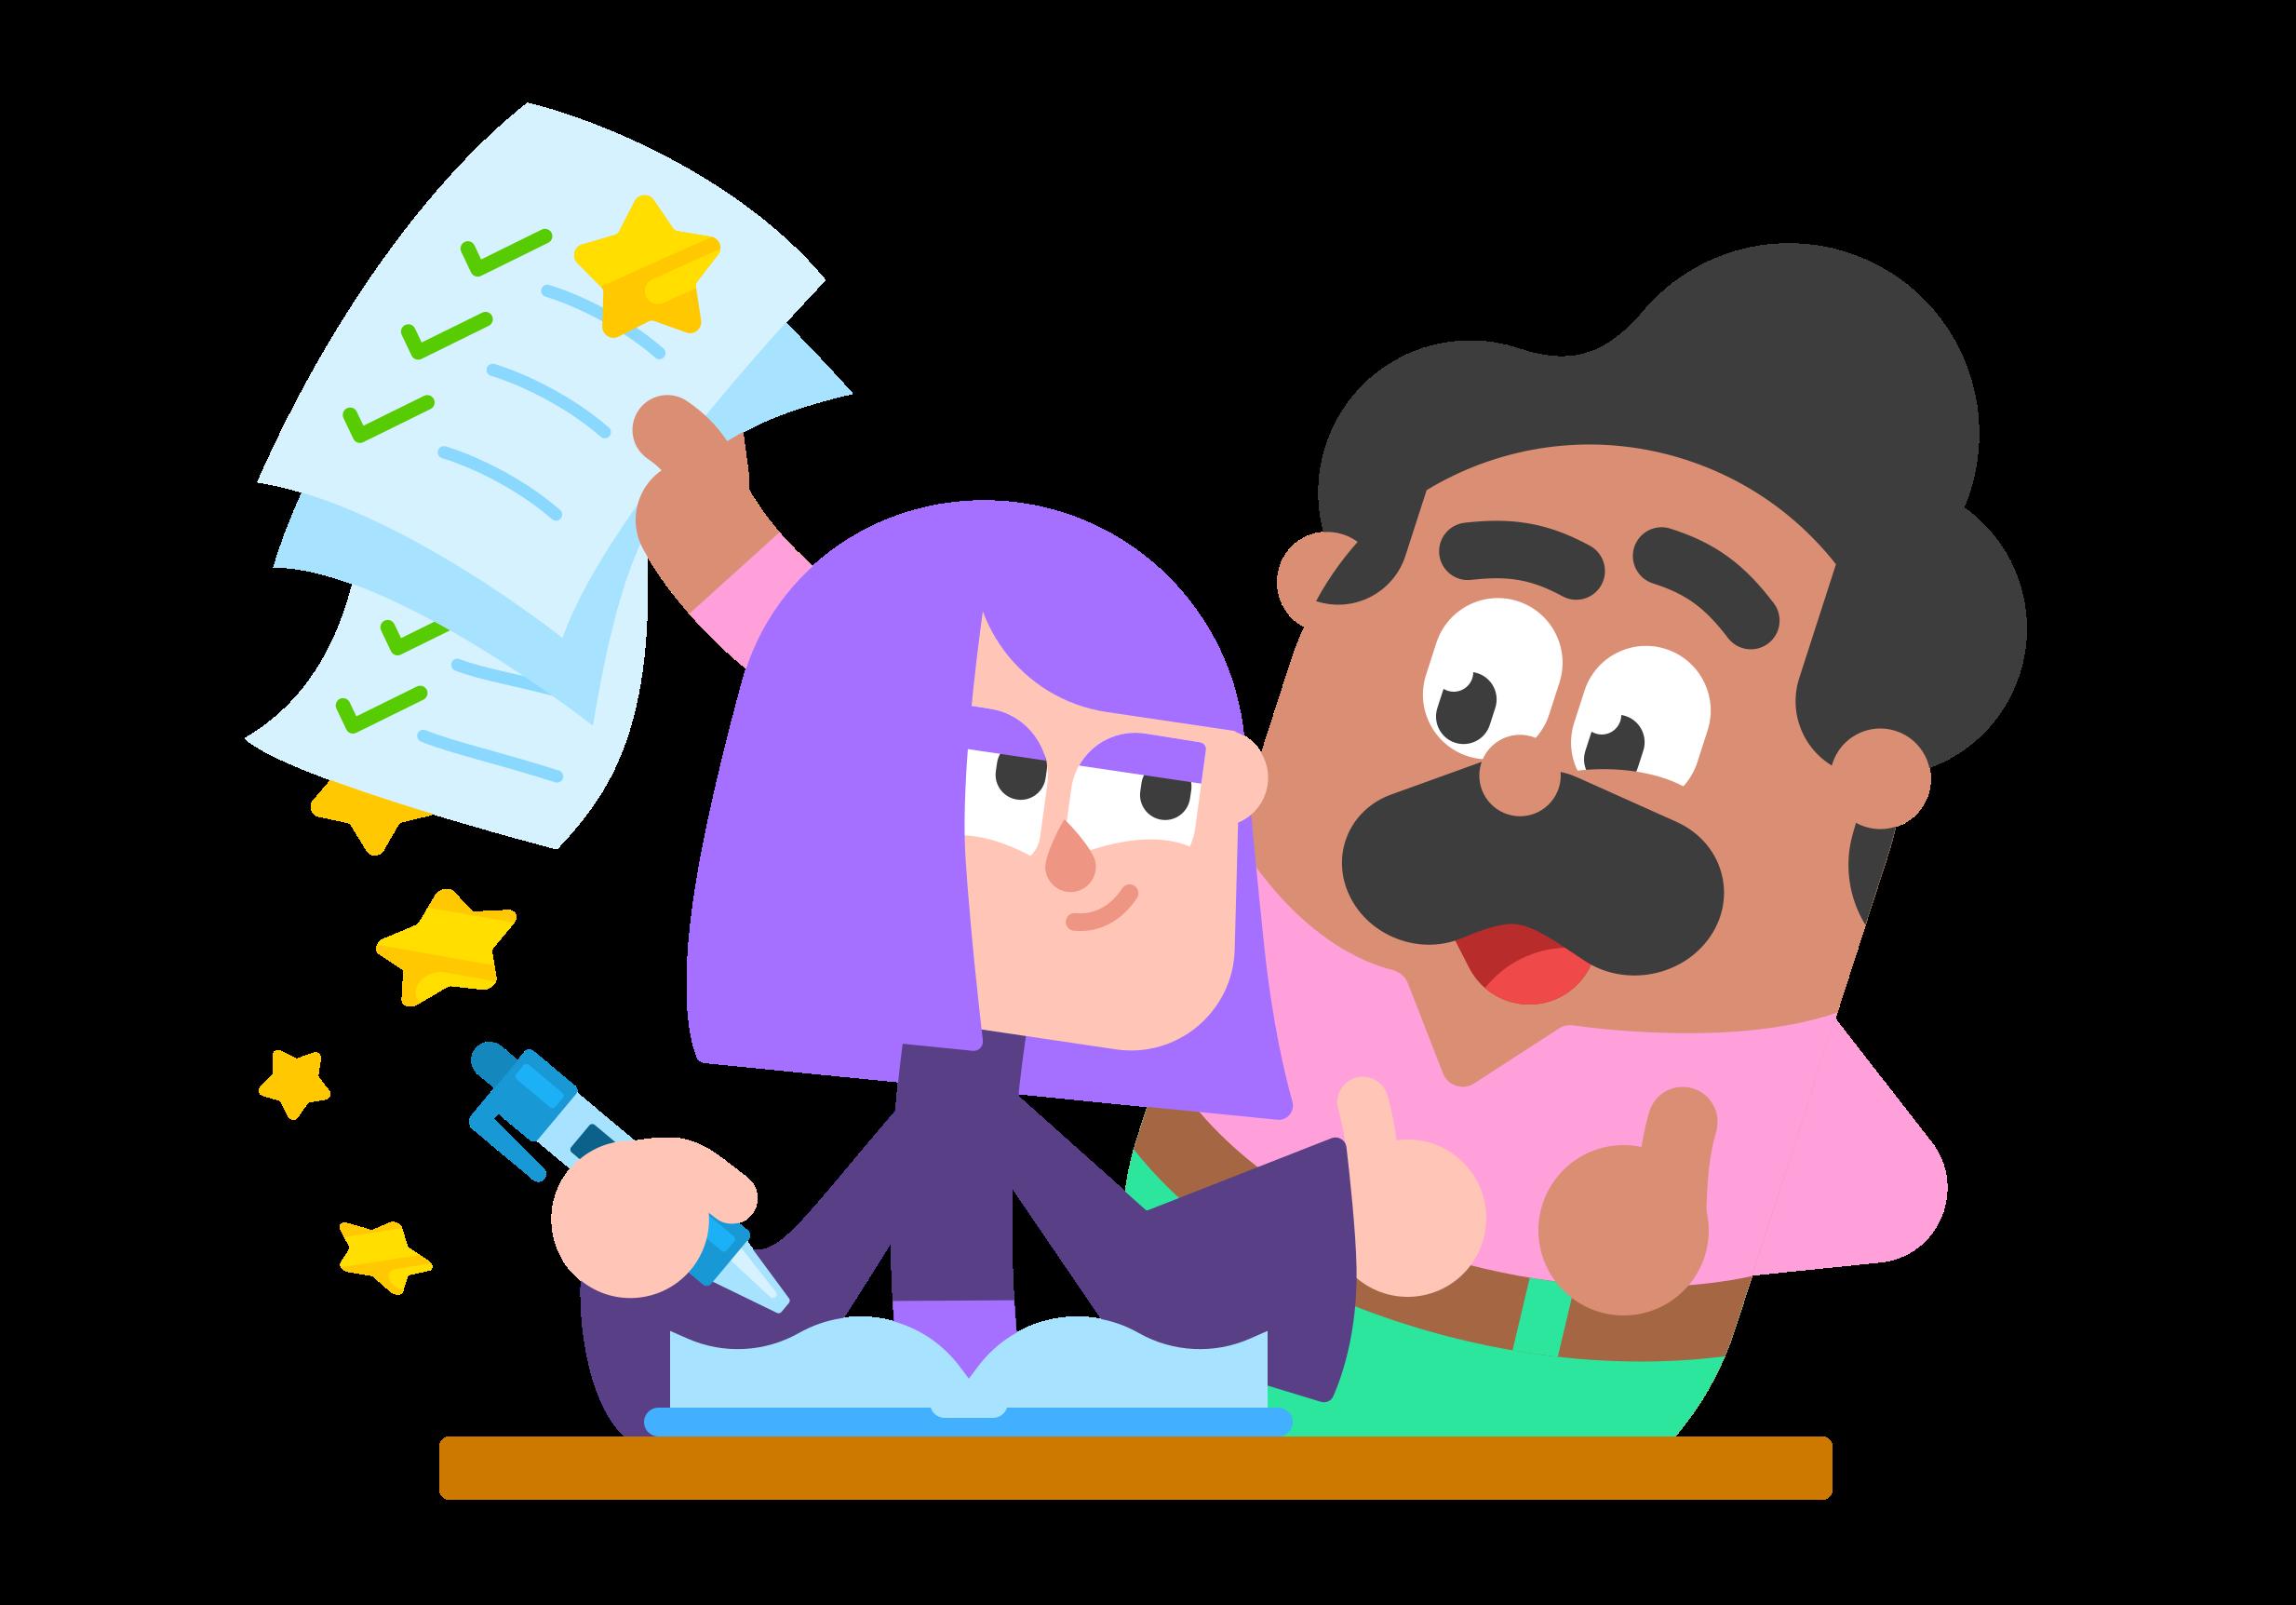 Two Duolingo characters learning